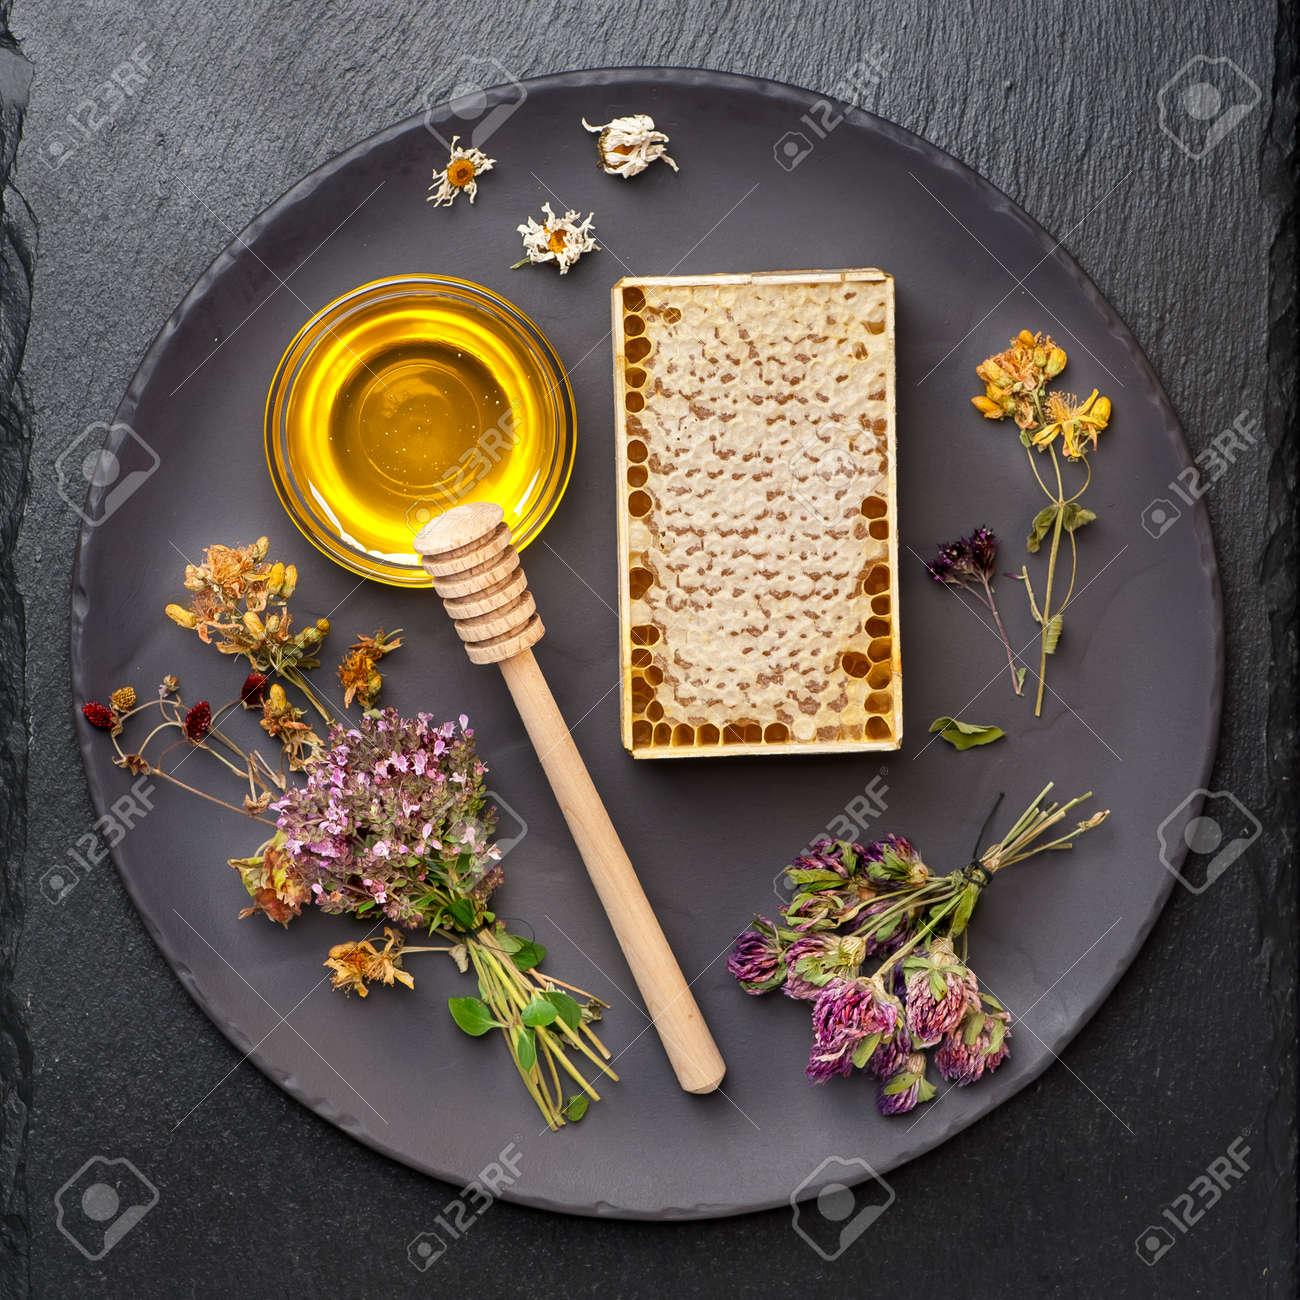 Honey, honeycomb and dried herbs on dark background - 32489614